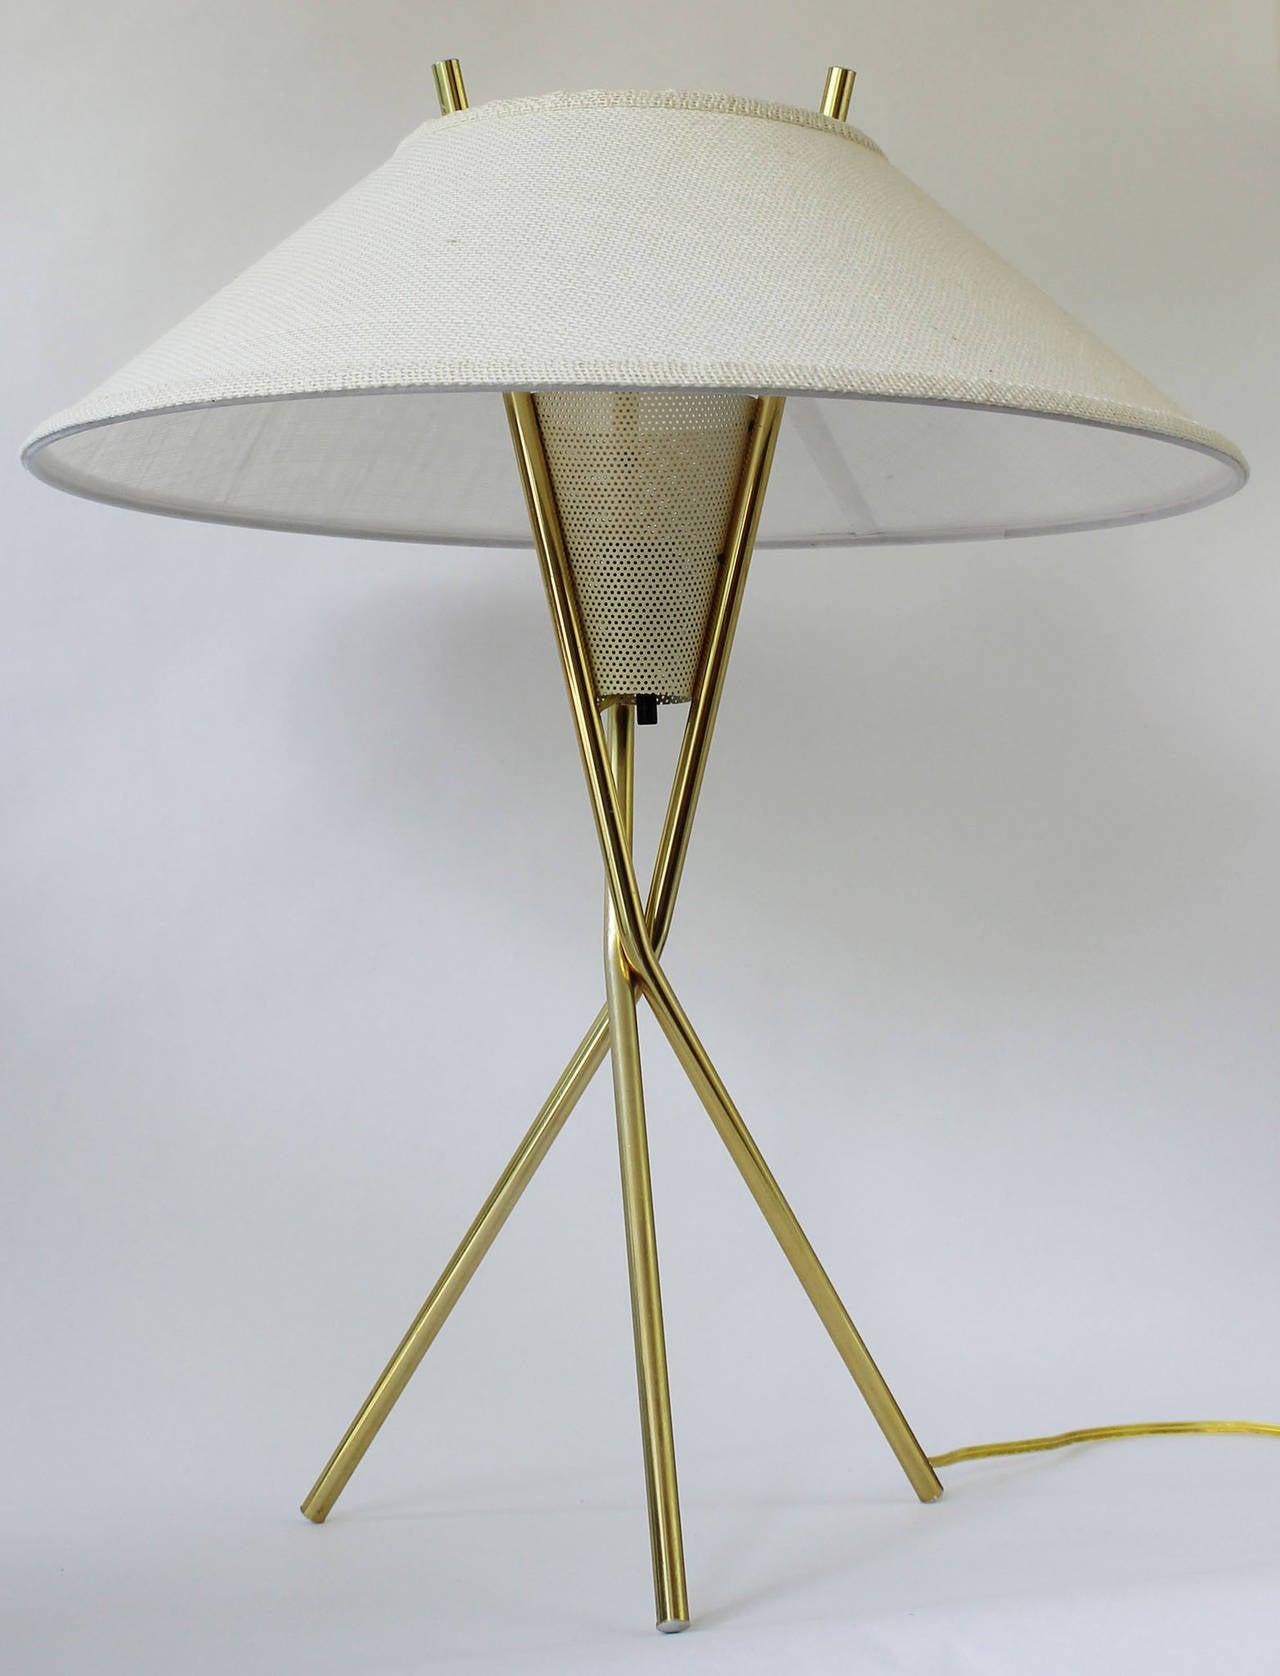 Pair gerald thurston tripod lamps at 1stdibs pair gerald thurston tripod lamps 2 geotapseo Image collections